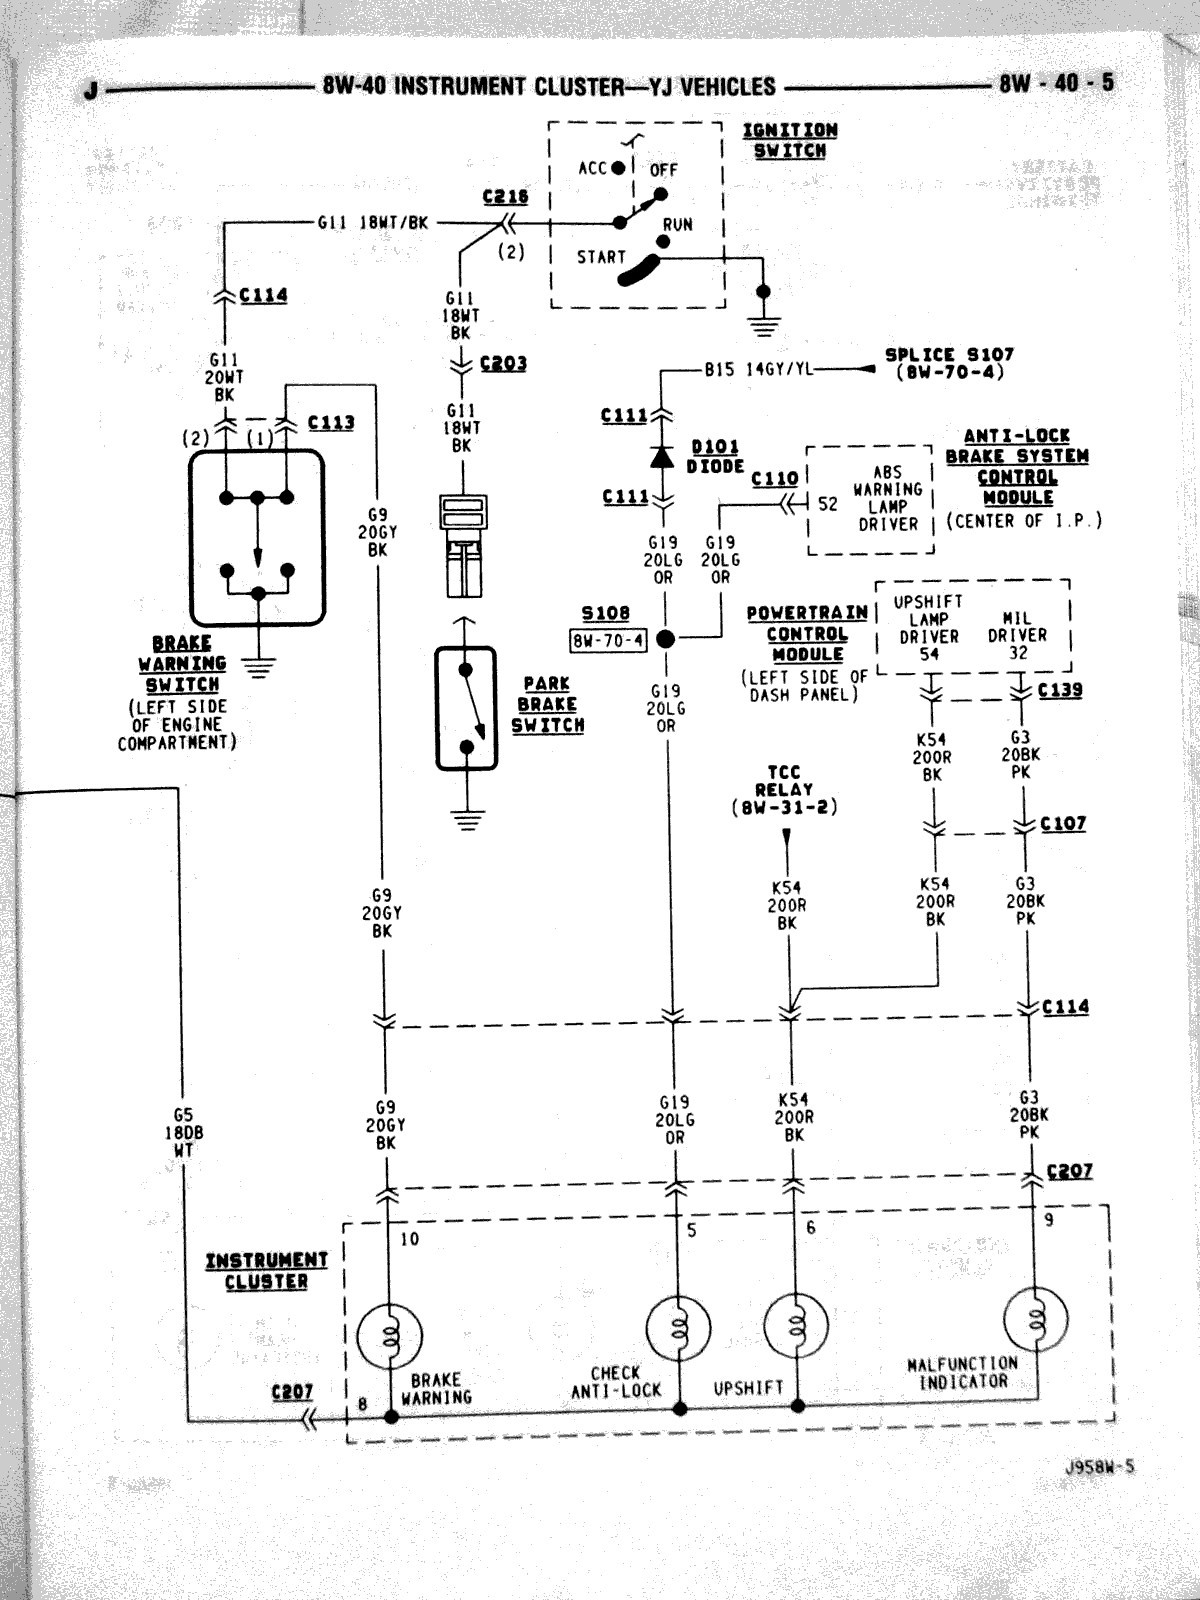 Jeep Wrangler Jk Wiring Diagram Free Fresh Wrangler Yj Wiring Diagram Wiring Diagram